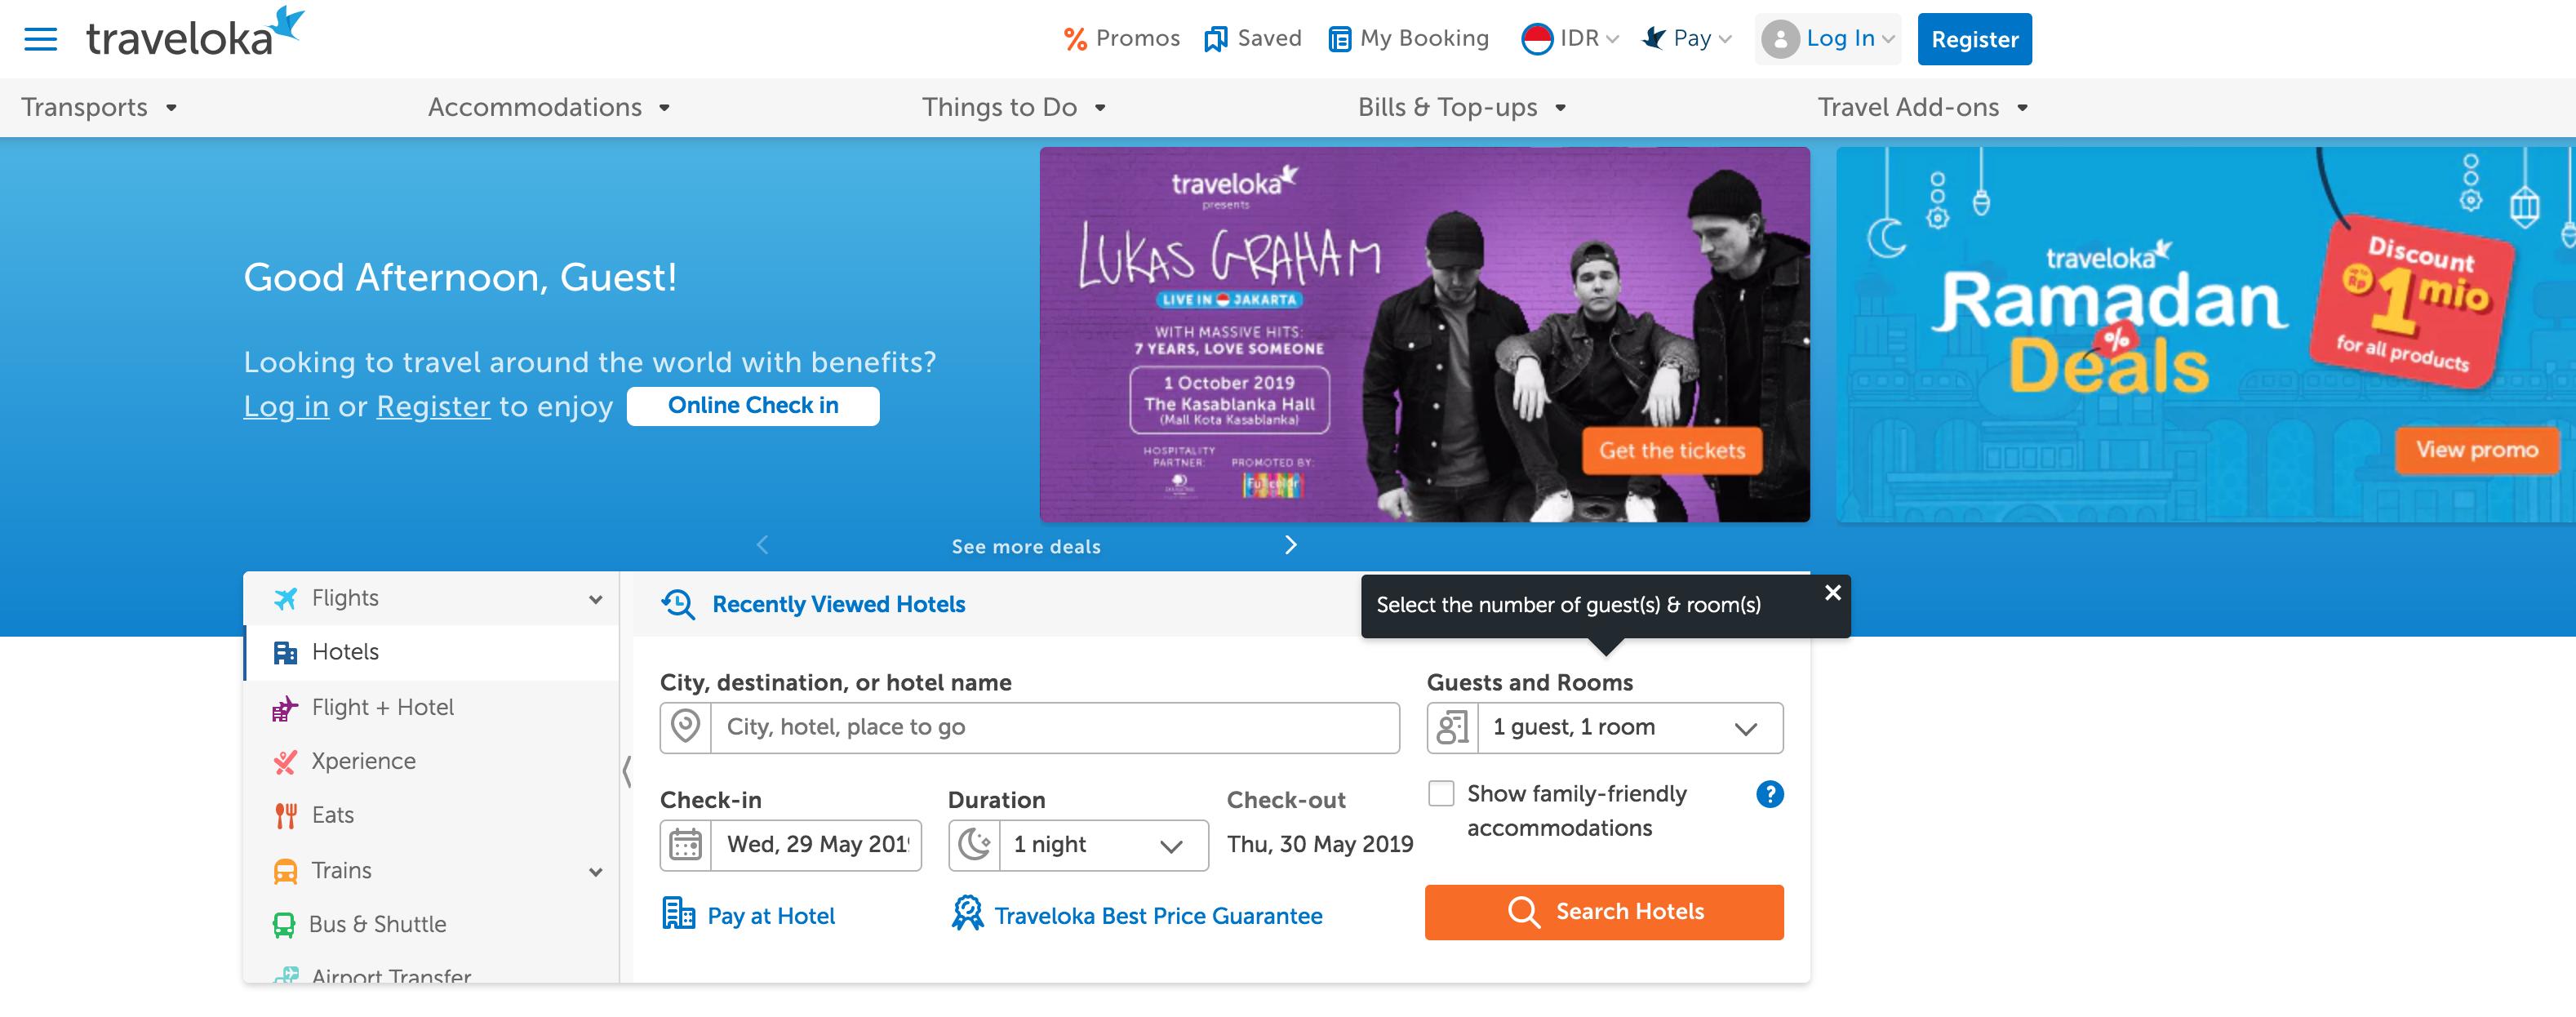 Expedia-Backed Traveloka Enters Insurance